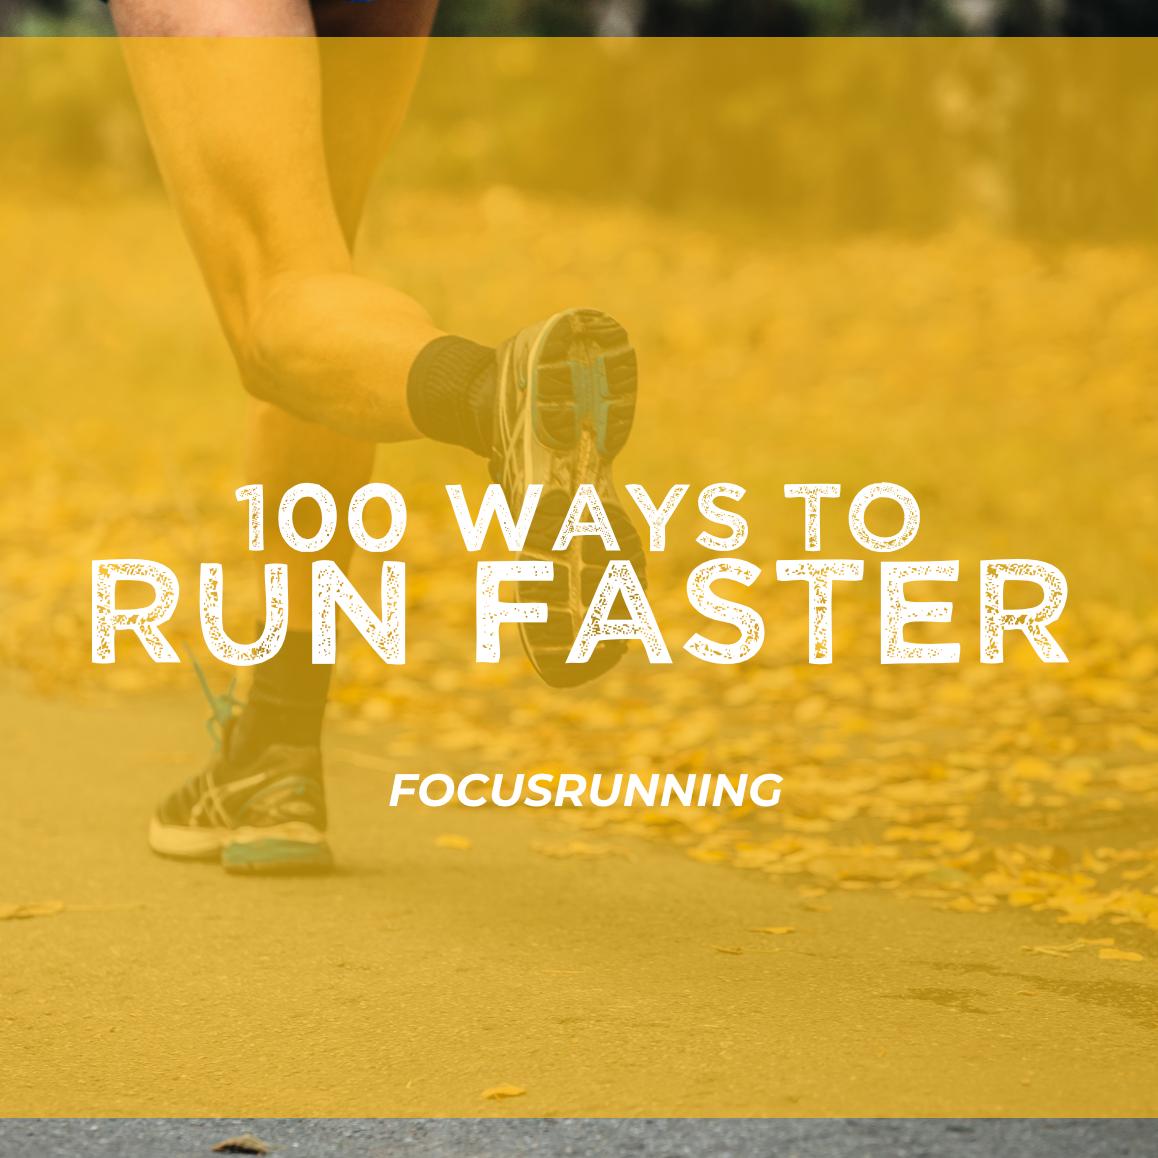 100 Ways to Run Faster